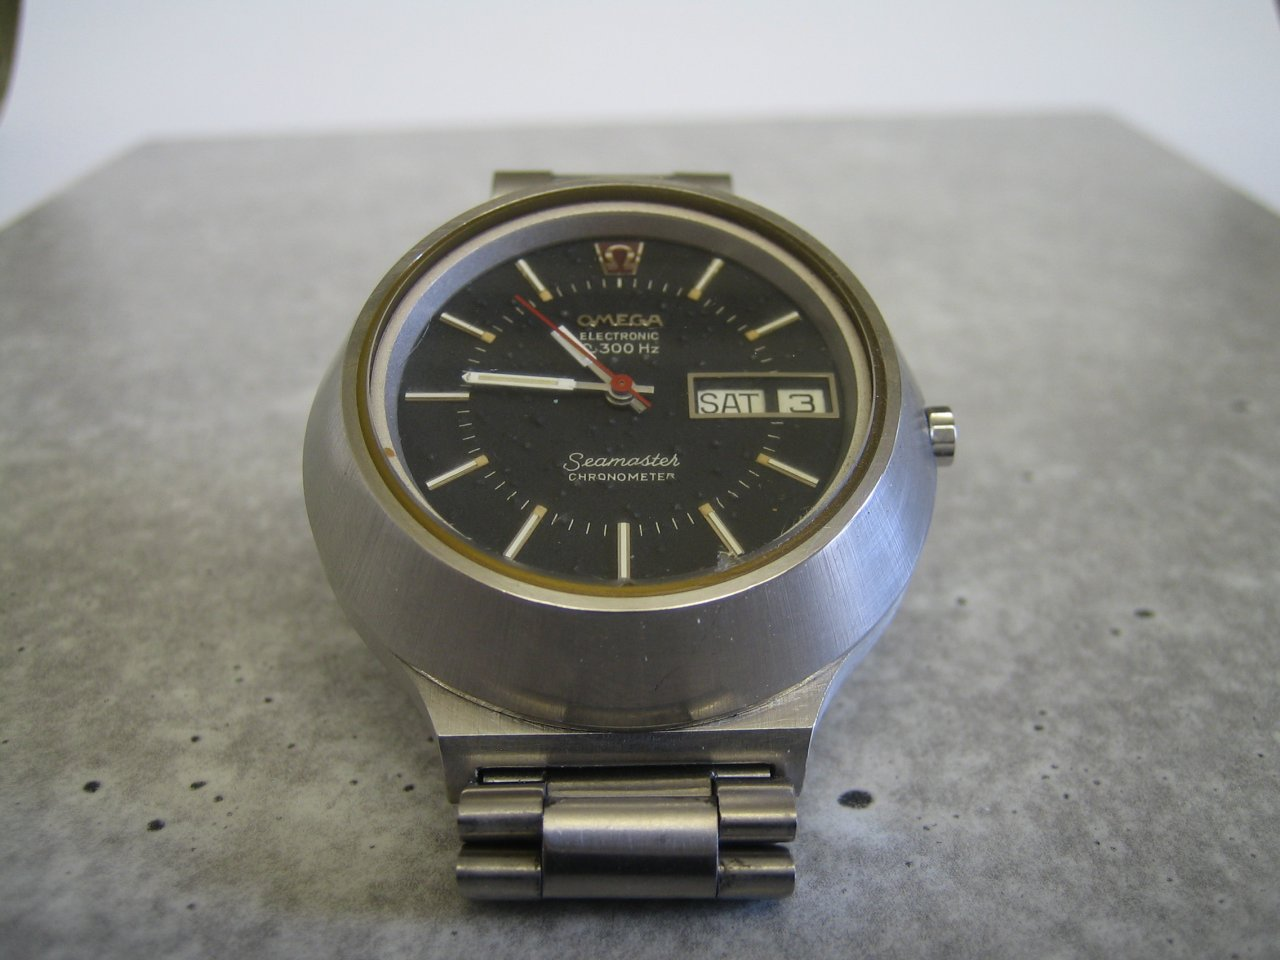 Omega Seamaster F300hz